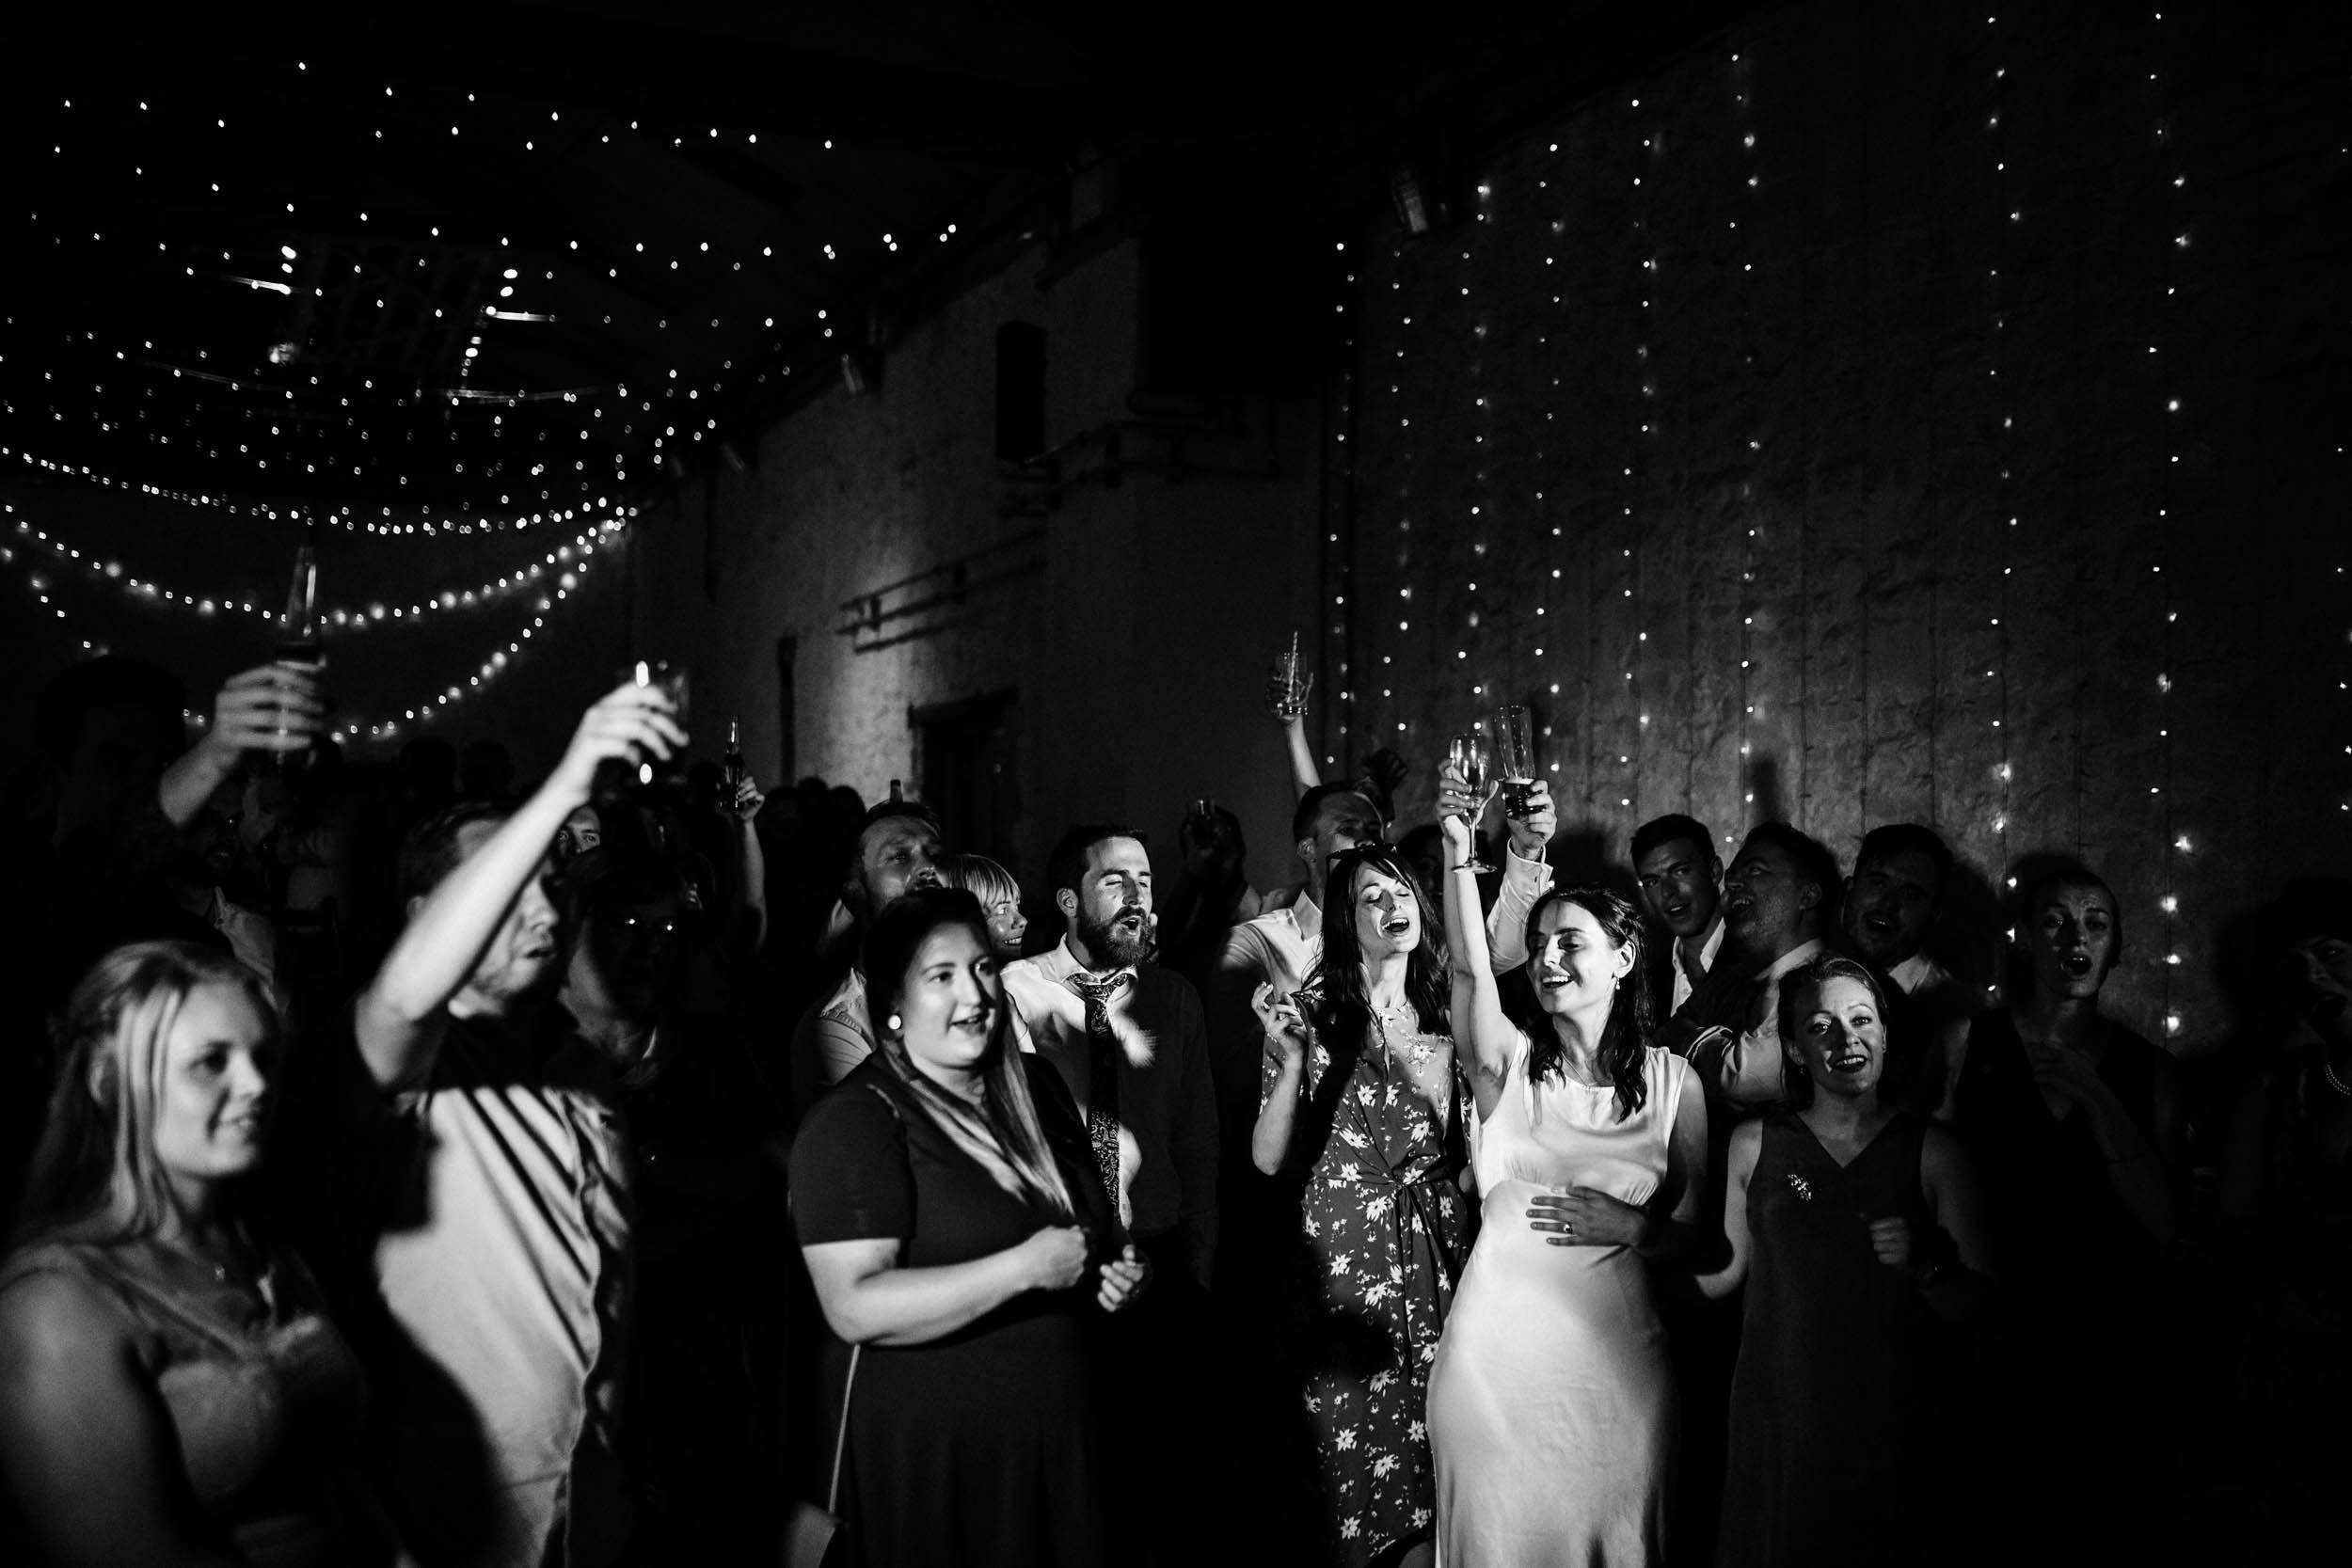 Alex_Sedgmond_Photography-SouthWalesWeddingPhotography-Wedding-Photographer-Cardiff-159.jpg